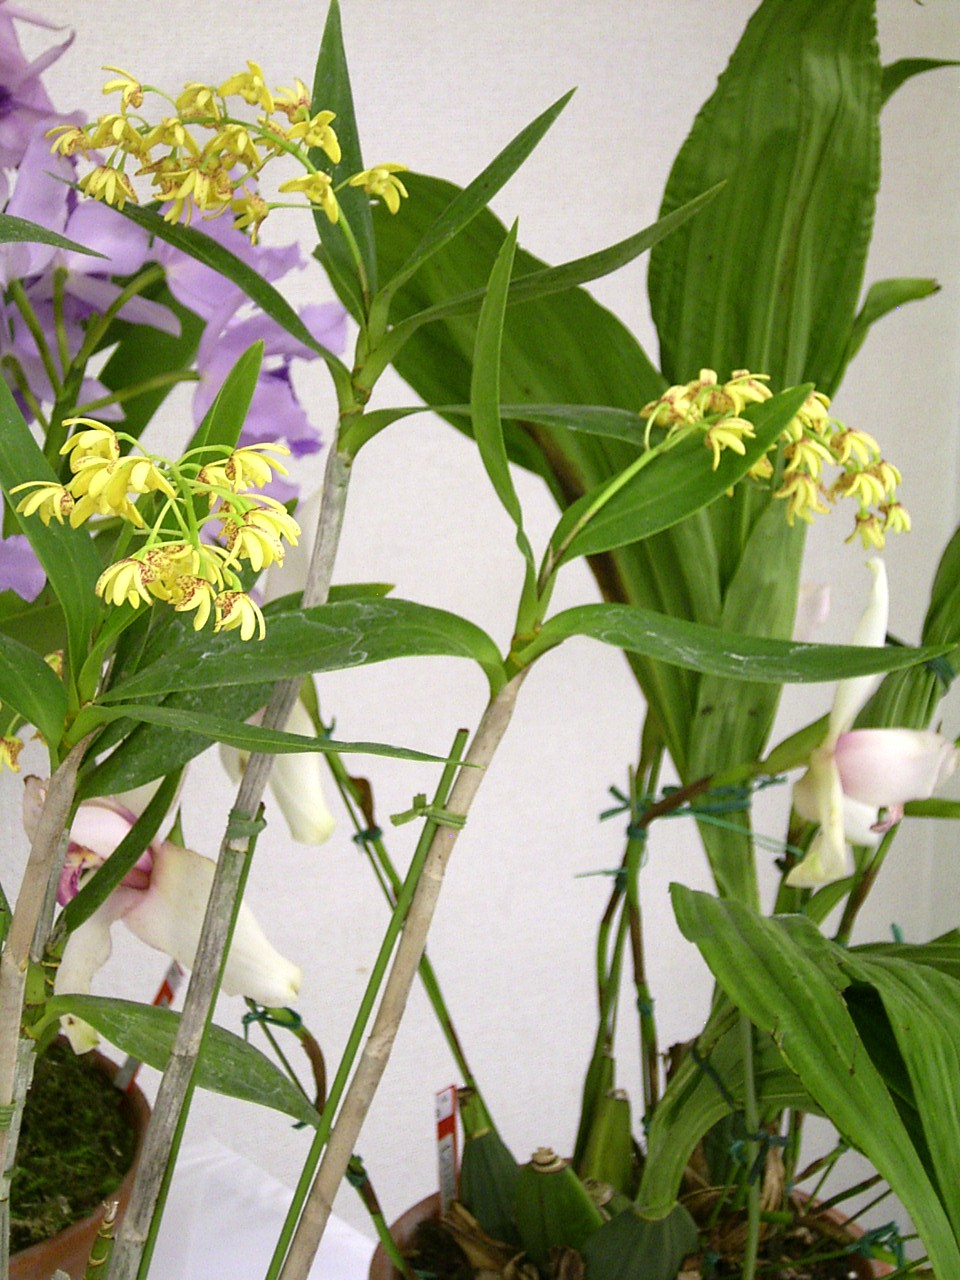 http://orchids.la.coocan.jp/Dendrobium/Dendrobium%20gracilicaule/R0053337.JPG